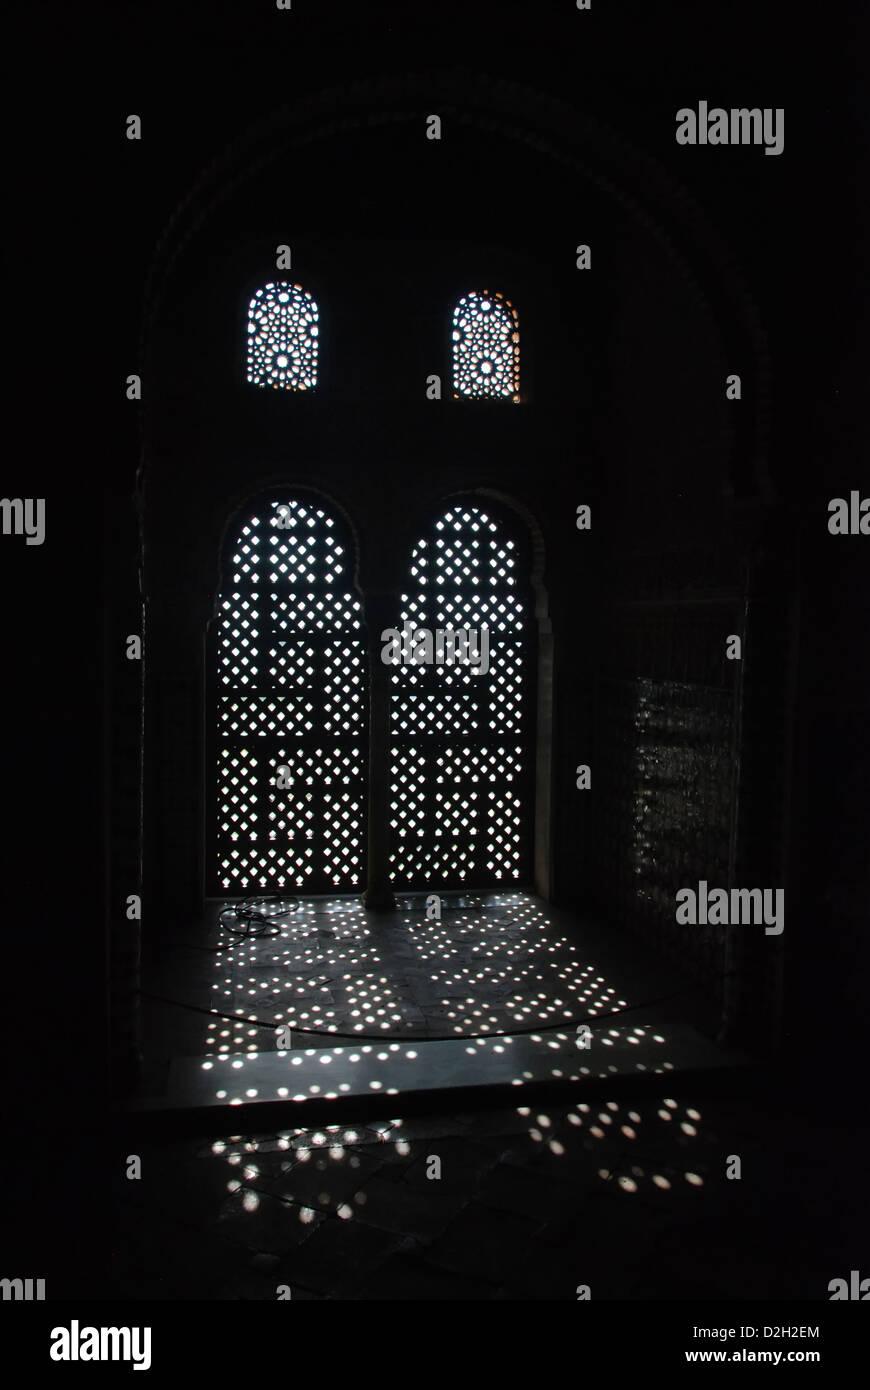 Dark room with light through window - Light Coming Into Dark Room Through A Moorish Window Of The Alhambra In Grenada